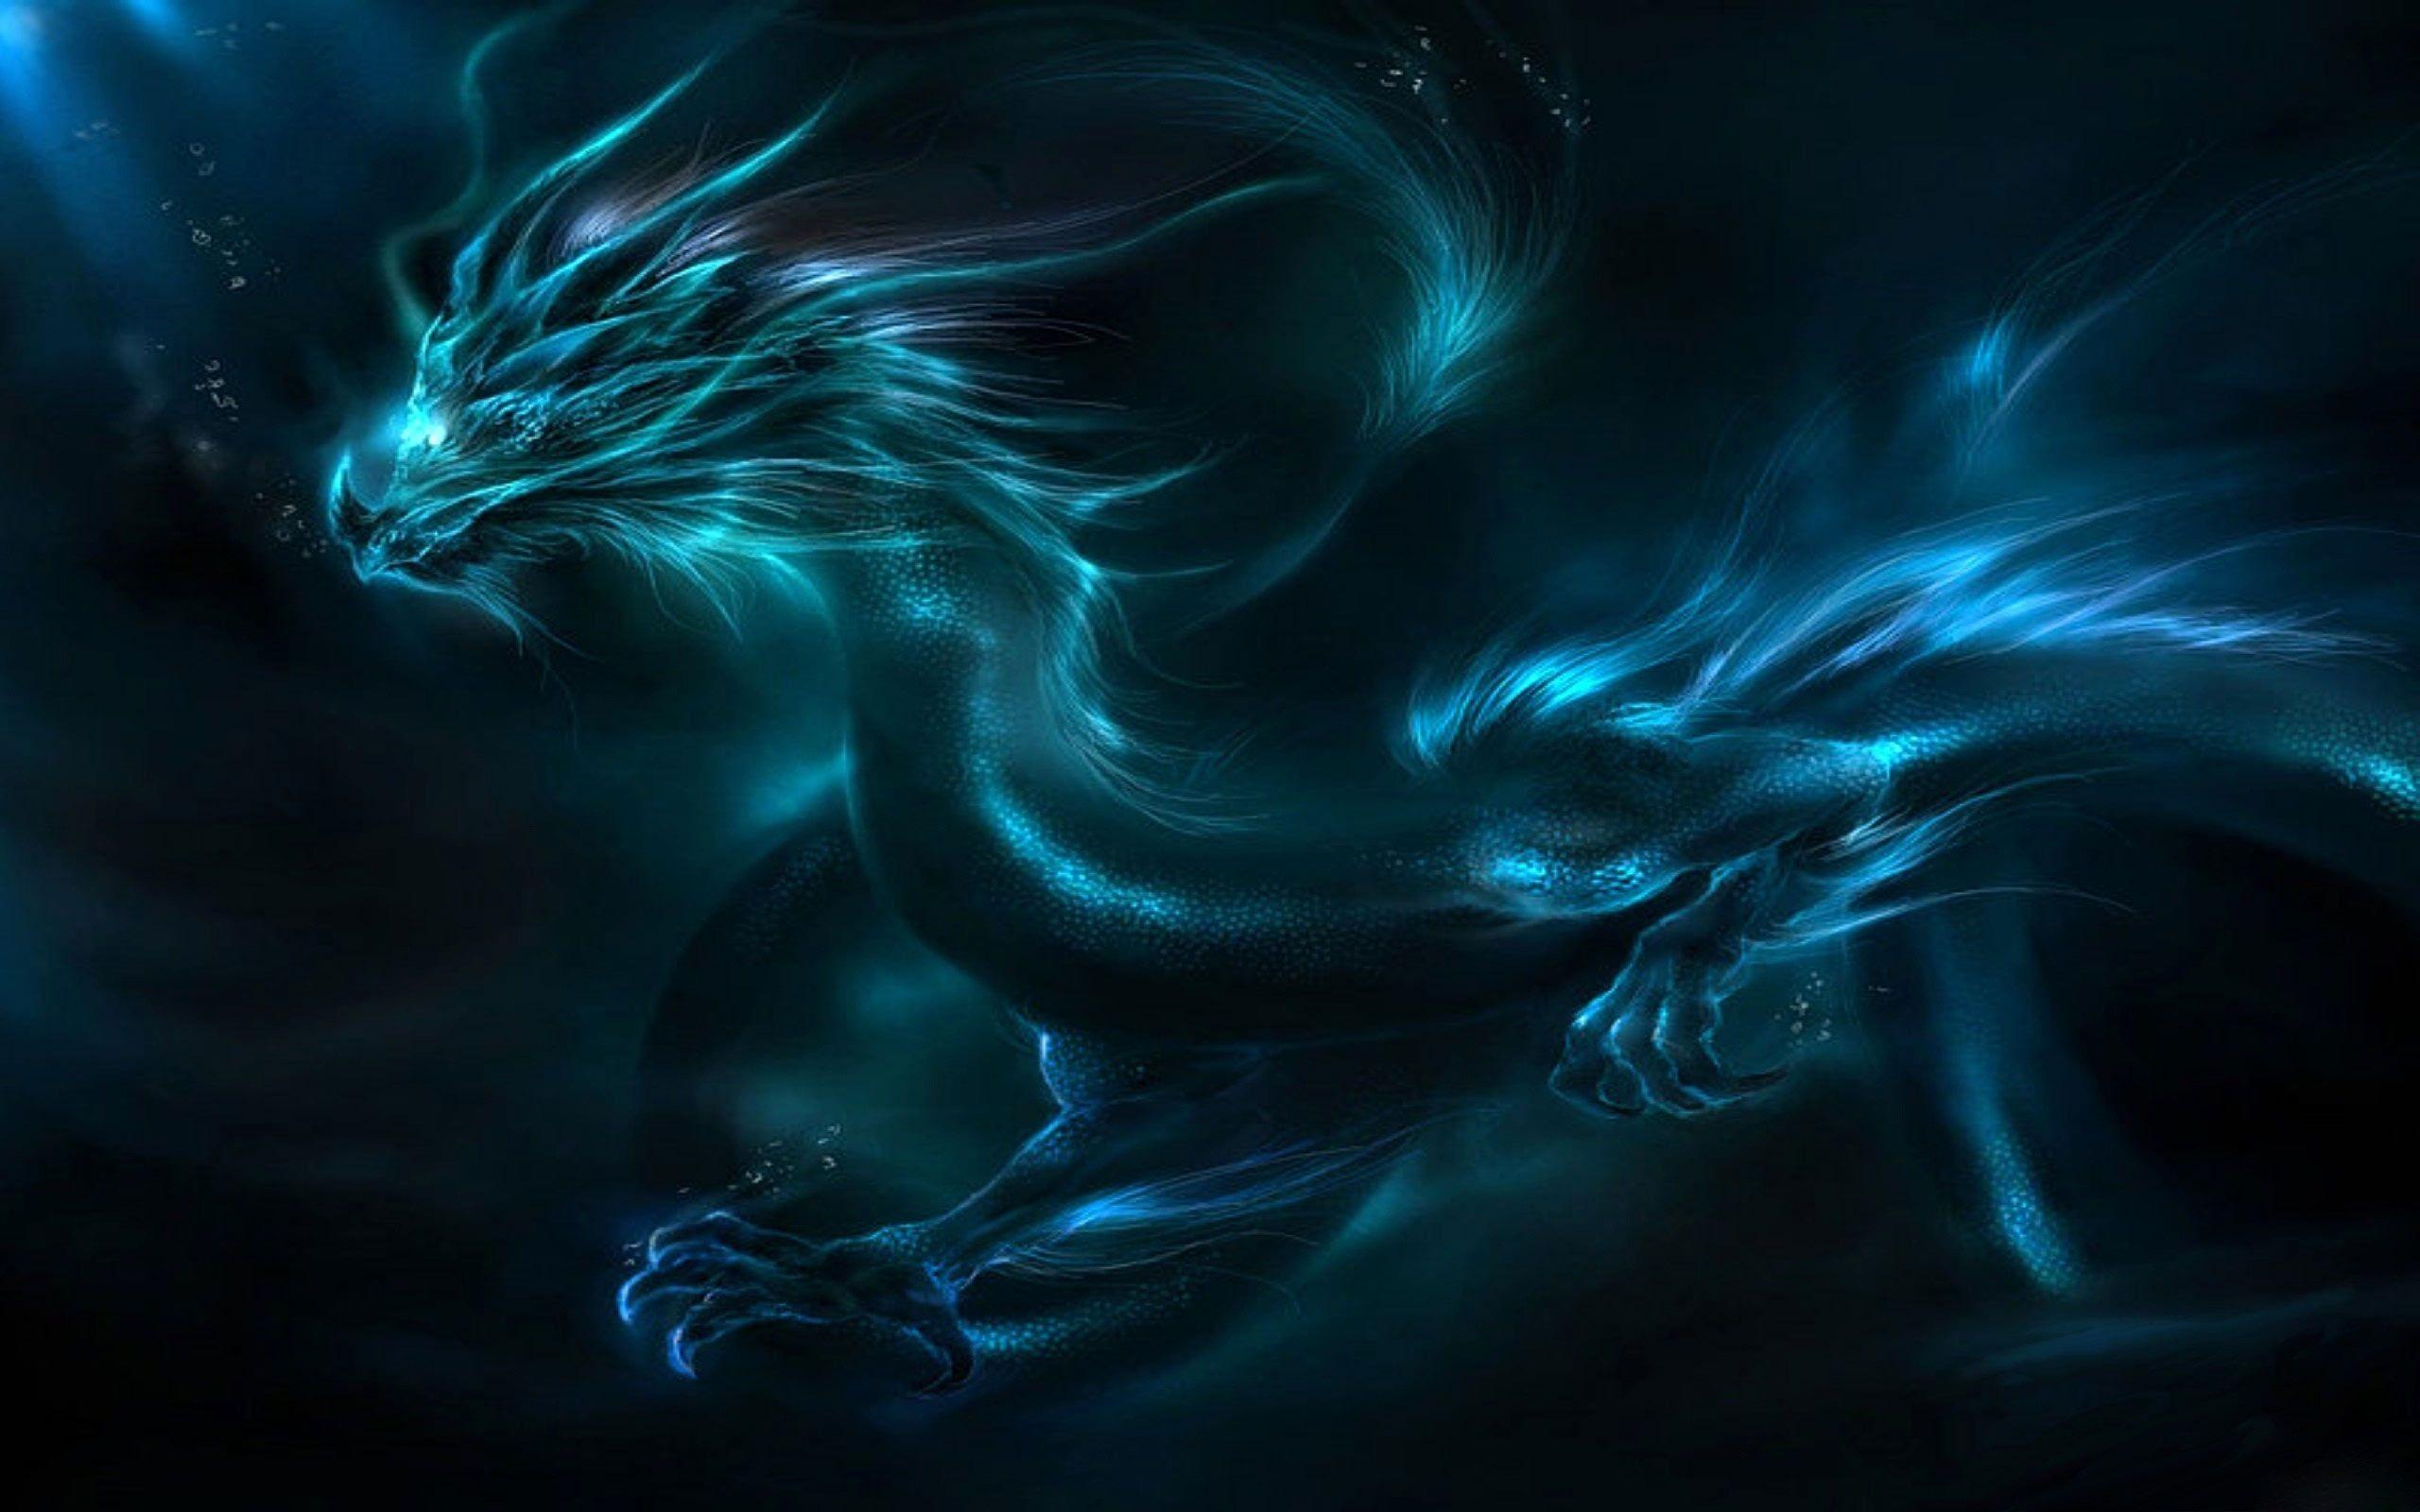 Res: 2560x1600, Water Dragon | WALLPAPERS | DESKTOP WALLPAPER | FREE DESKTOP BACKGROUNDS |  PHOTOS .